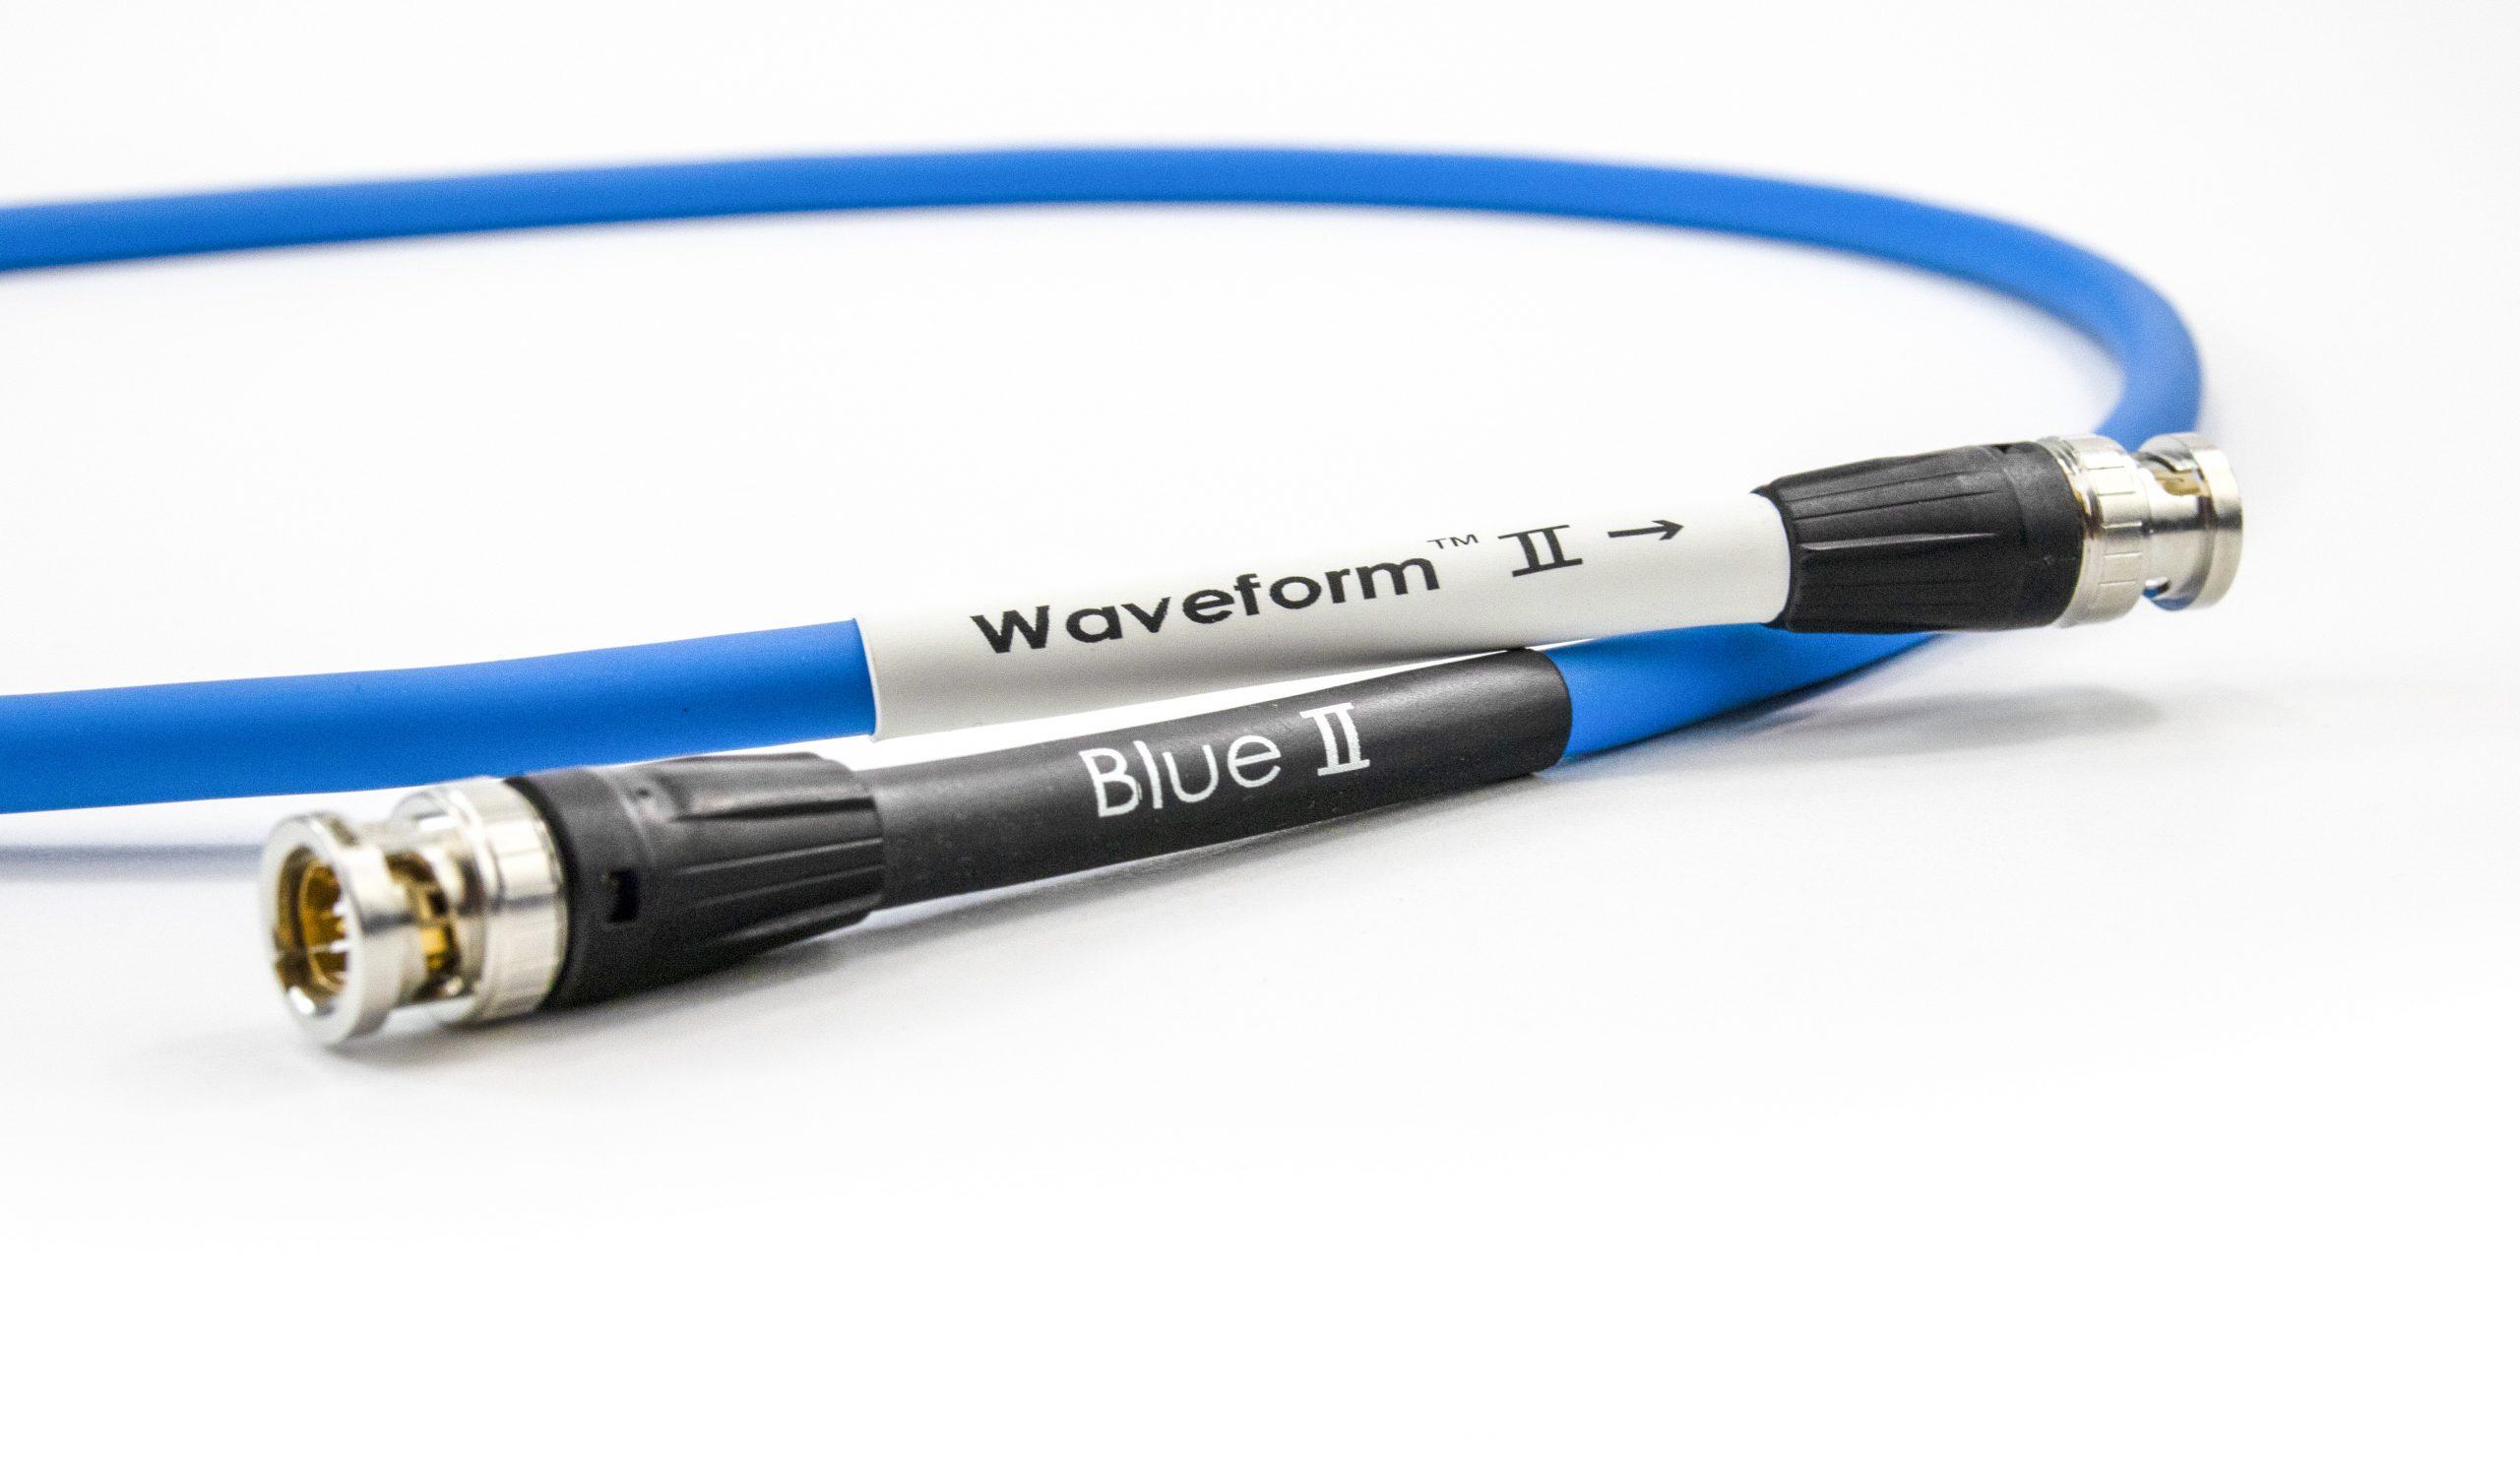 Blue II BNC 3